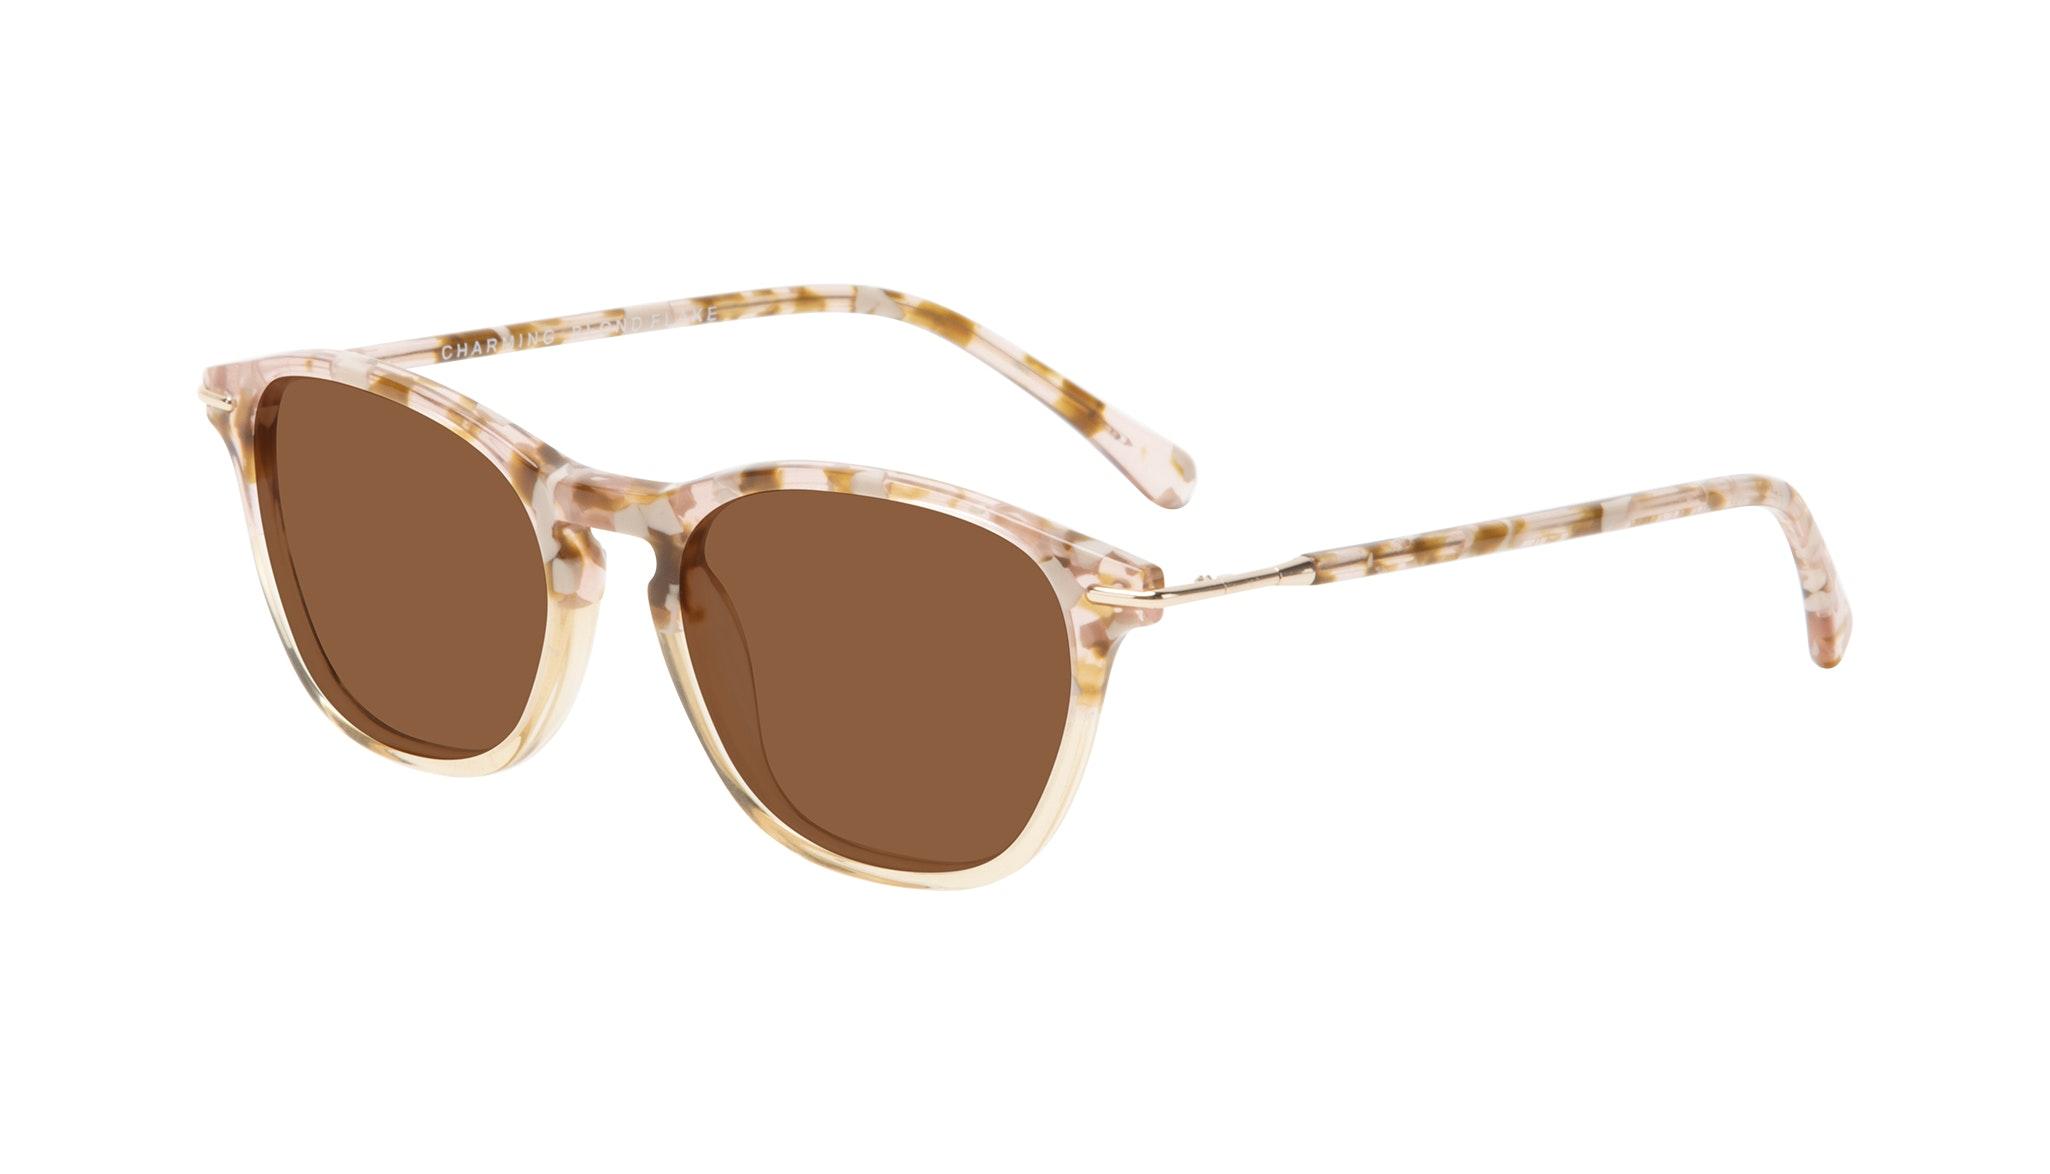 Affordable Fashion Glasses Square Sunglasses Women Charming Blond Flake Tilt